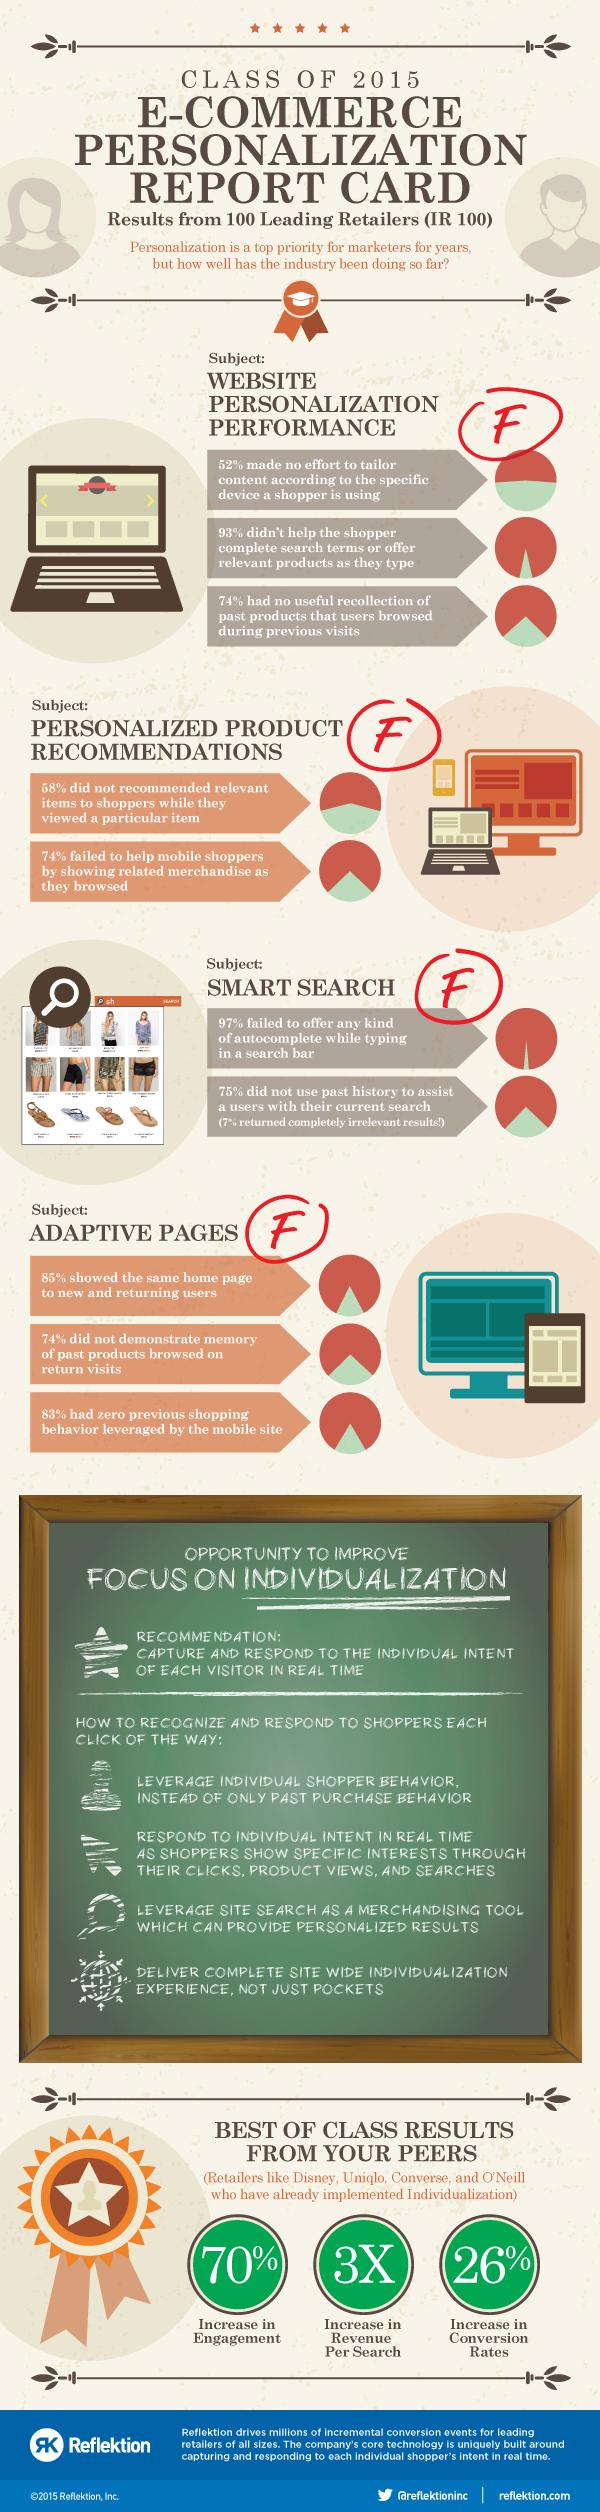 Personalization Reportcard Infographic